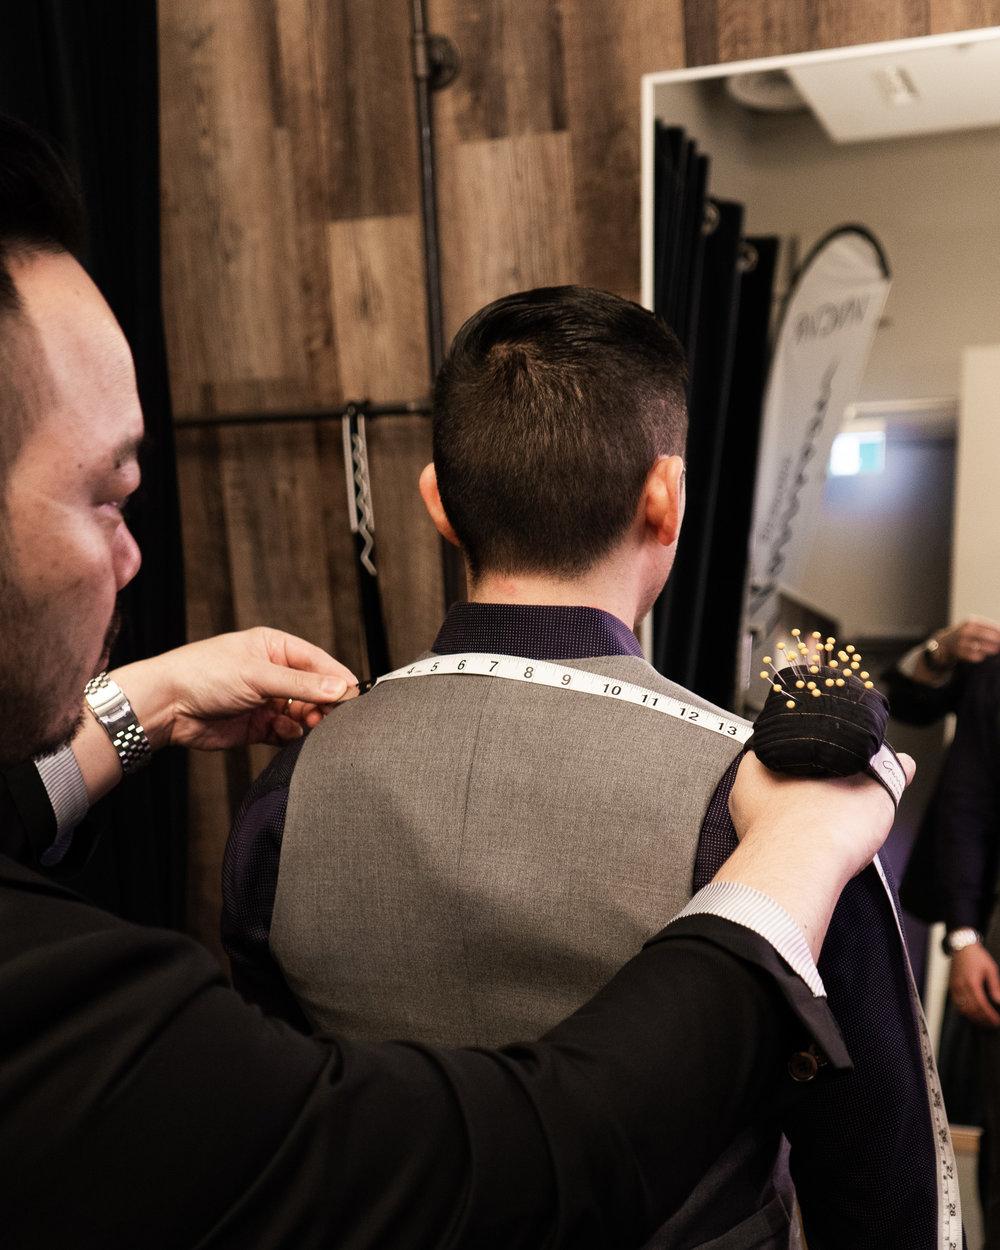 Bespoke-suit-consult-measurments.jpg